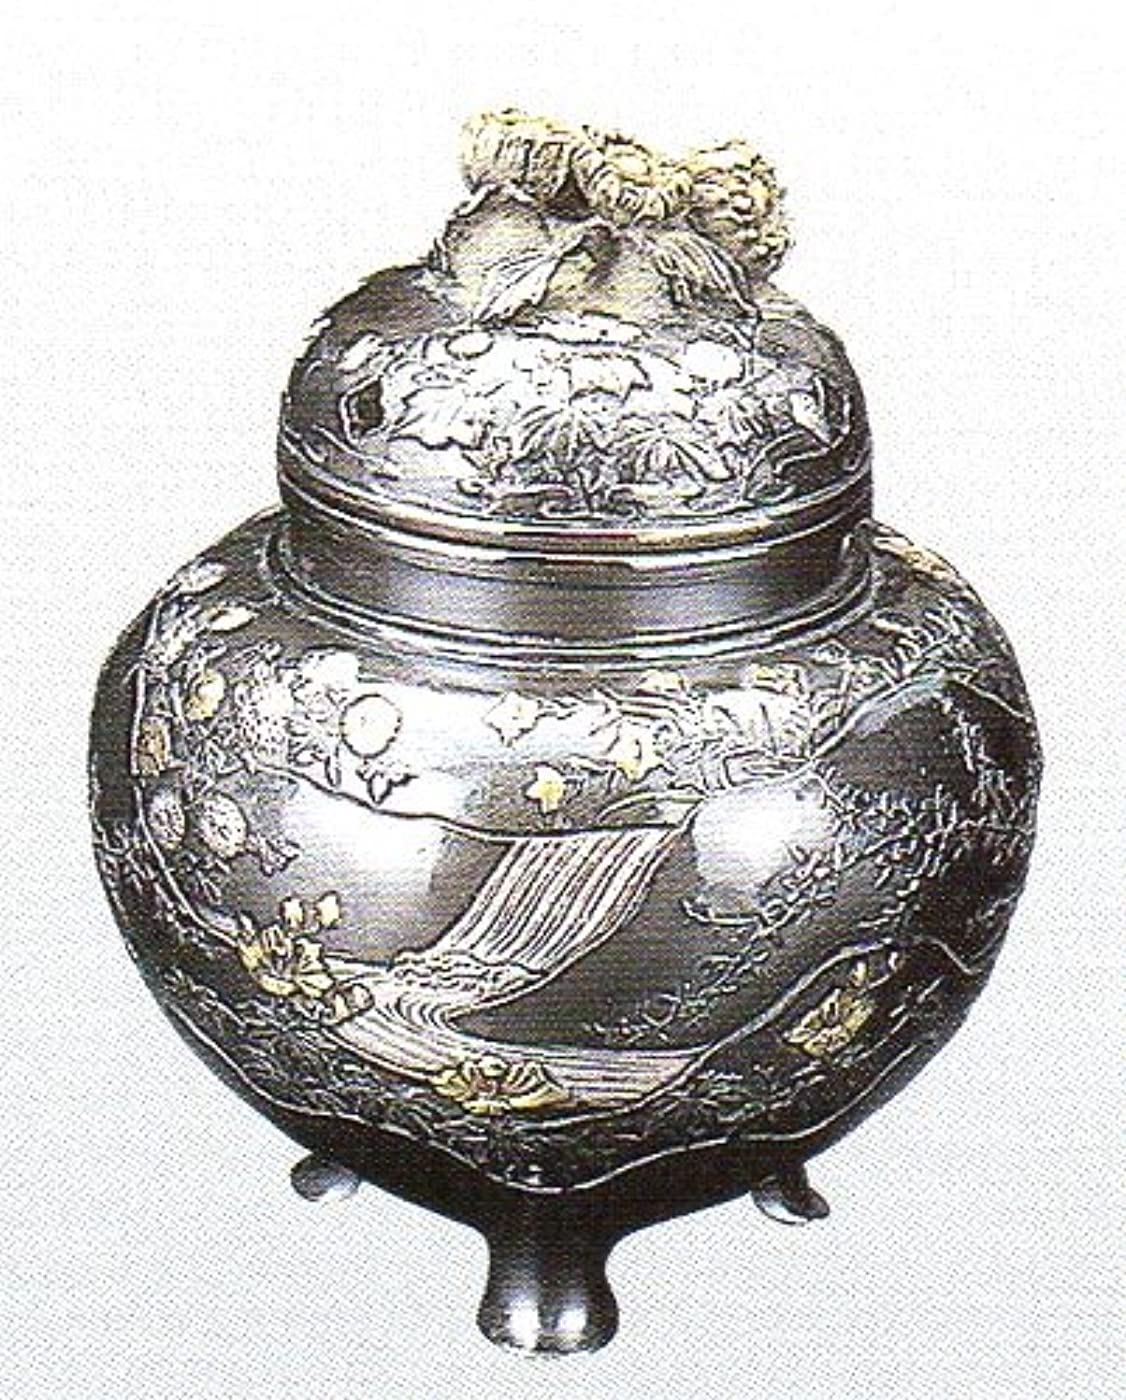 ケープ置き場科学者香炉 四季 蝋型青銅製 桐箱入 高さ10.2×幅9.2×奥行9.2cm